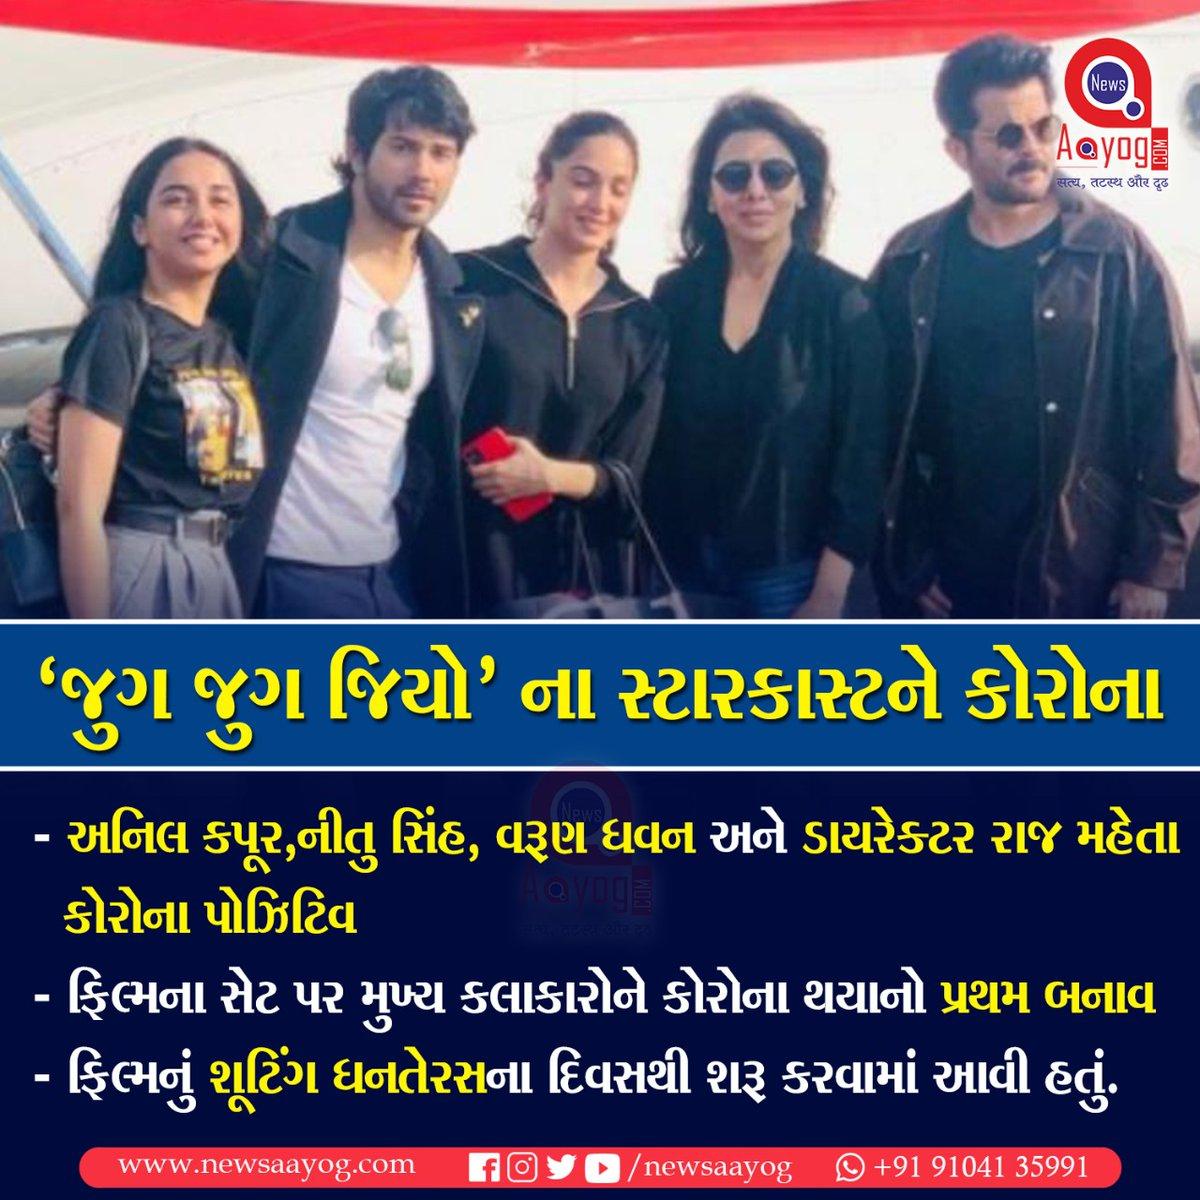 #BreakingNews : 'જુગ જુગ જિયો' ના સ્ટારકાસ્ટને  કોરોના  * વધુ માહિતી માટે  Join our WhatsApp Group :    #Bollywood #BollywoodActors #AnilKapoor #NeetuSingh #VarunDhawan #FilmShooting #LatestNews #OnlineNews #NewsAayog